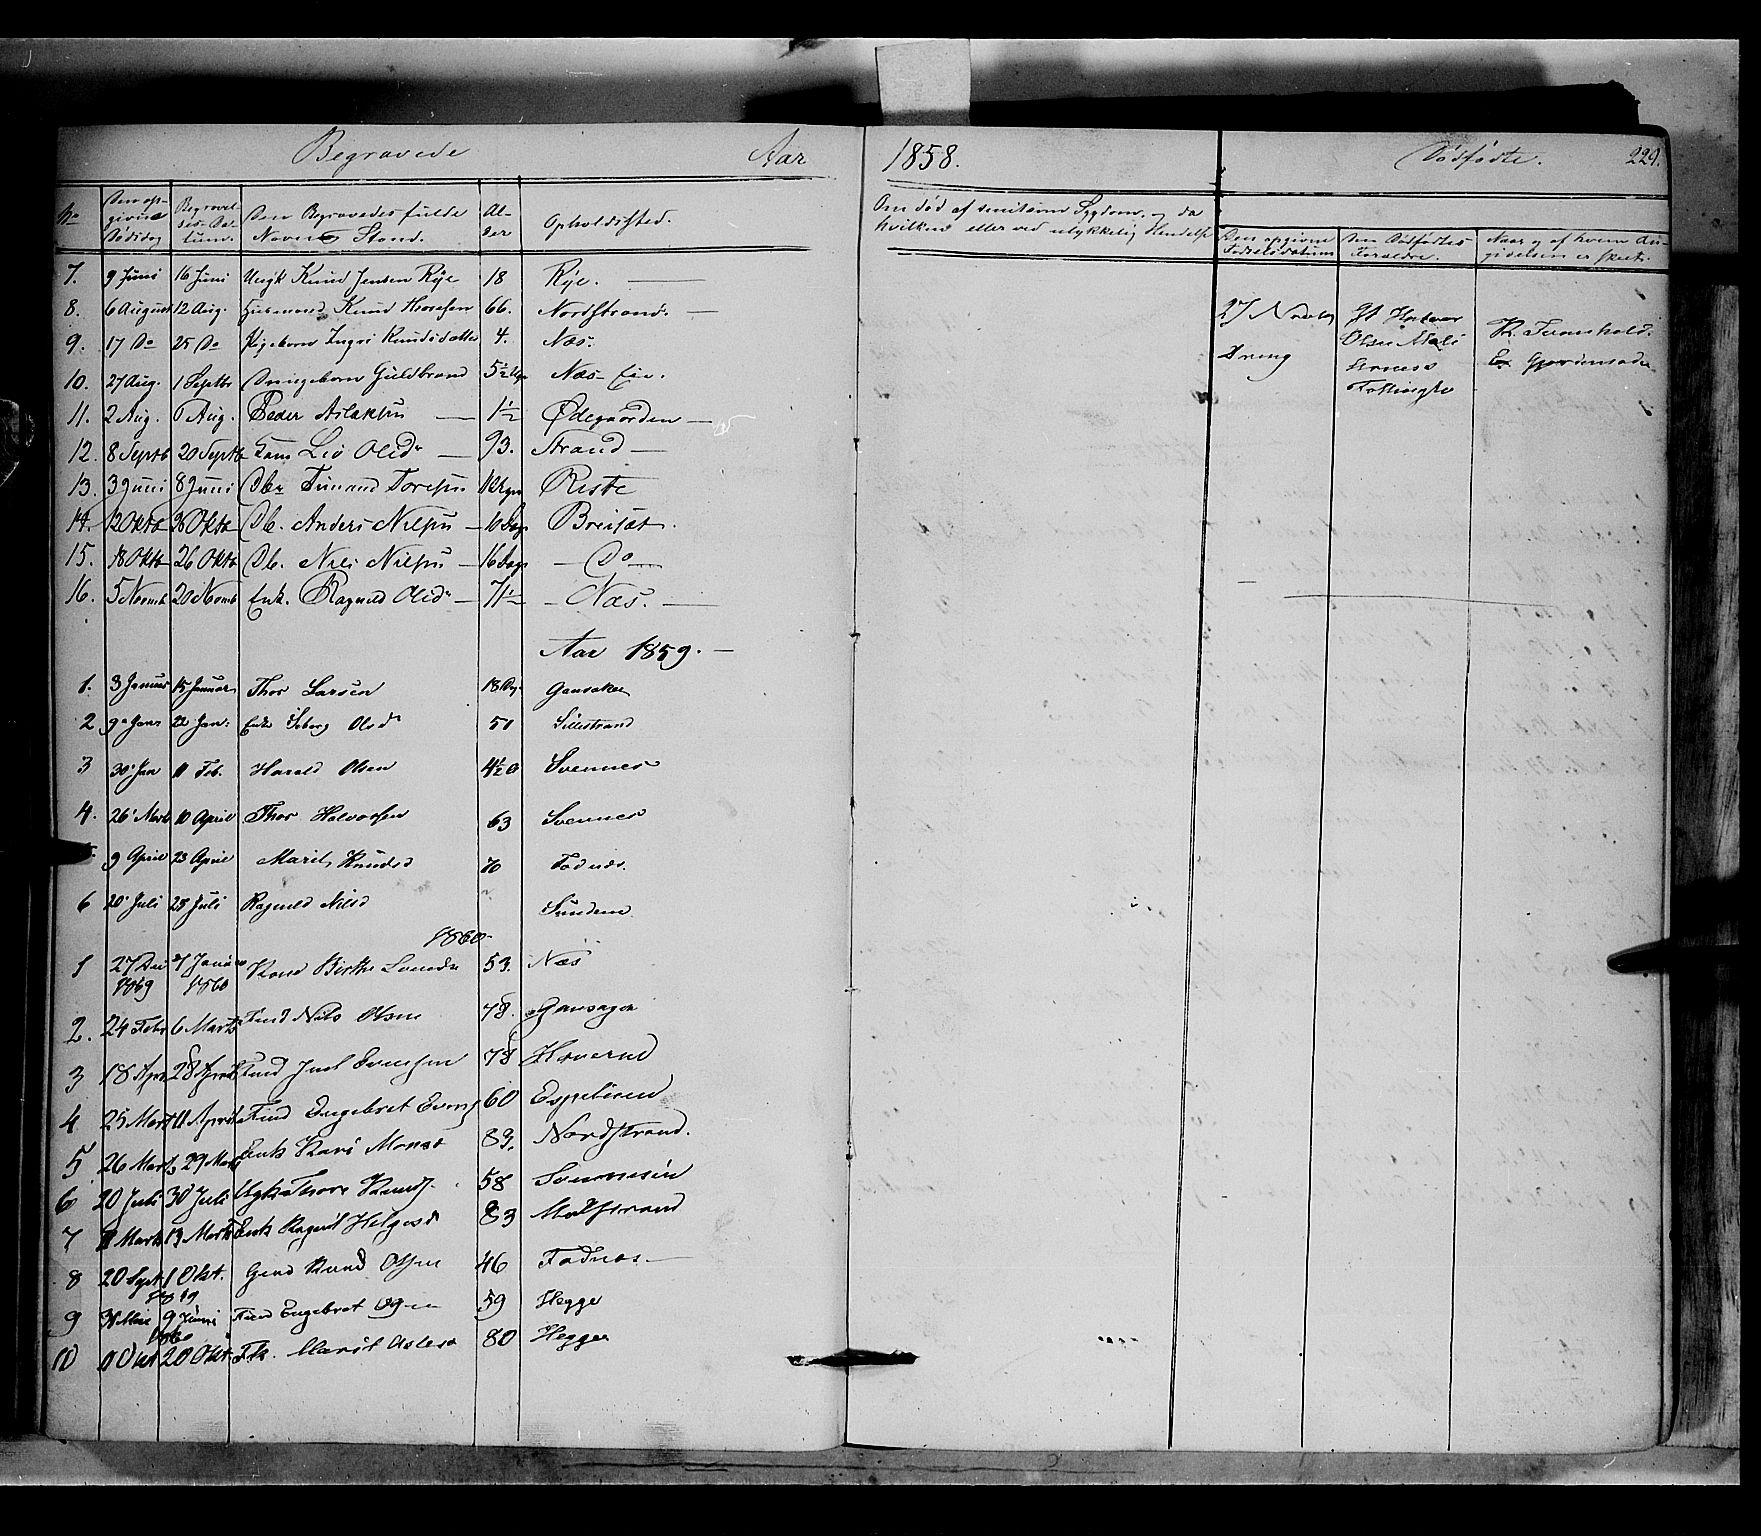 SAH, Nord-Aurdal prestekontor, Ministerialbok nr. 5, 1842-1863, s. 229